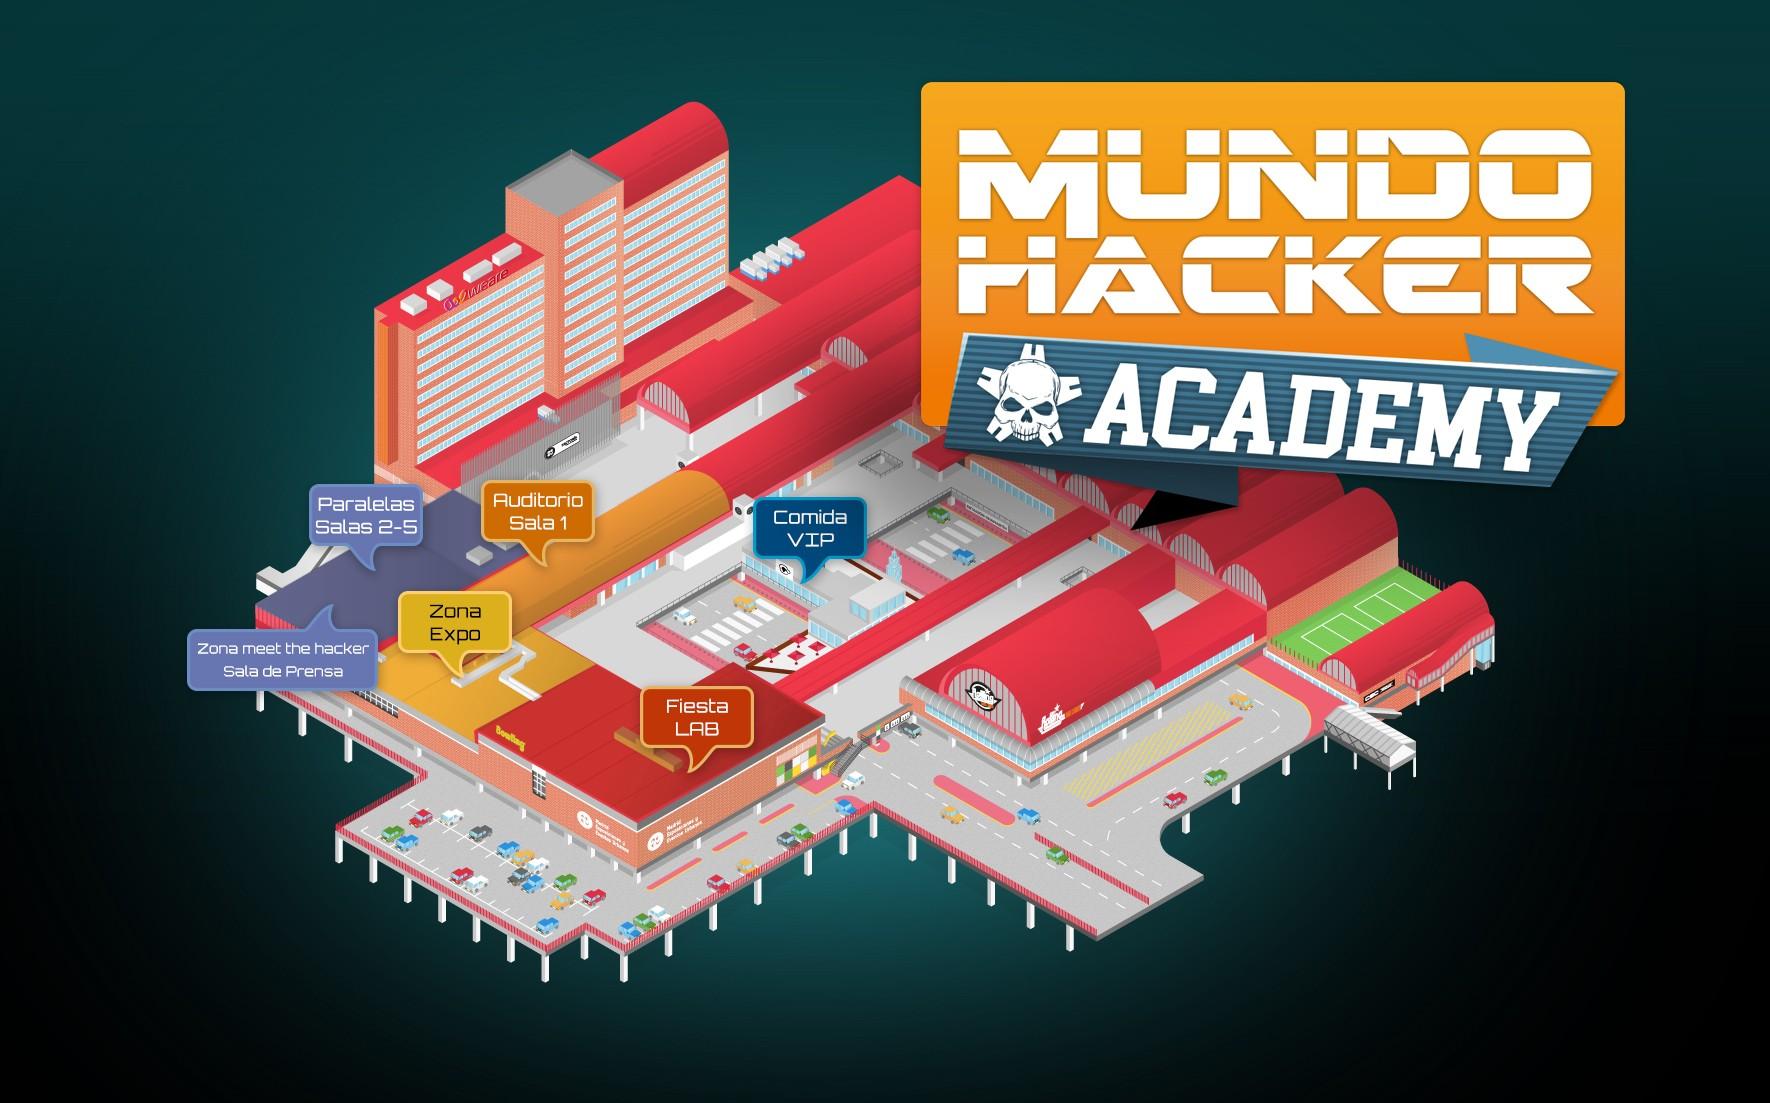 Plano Mundo Hacker Academy